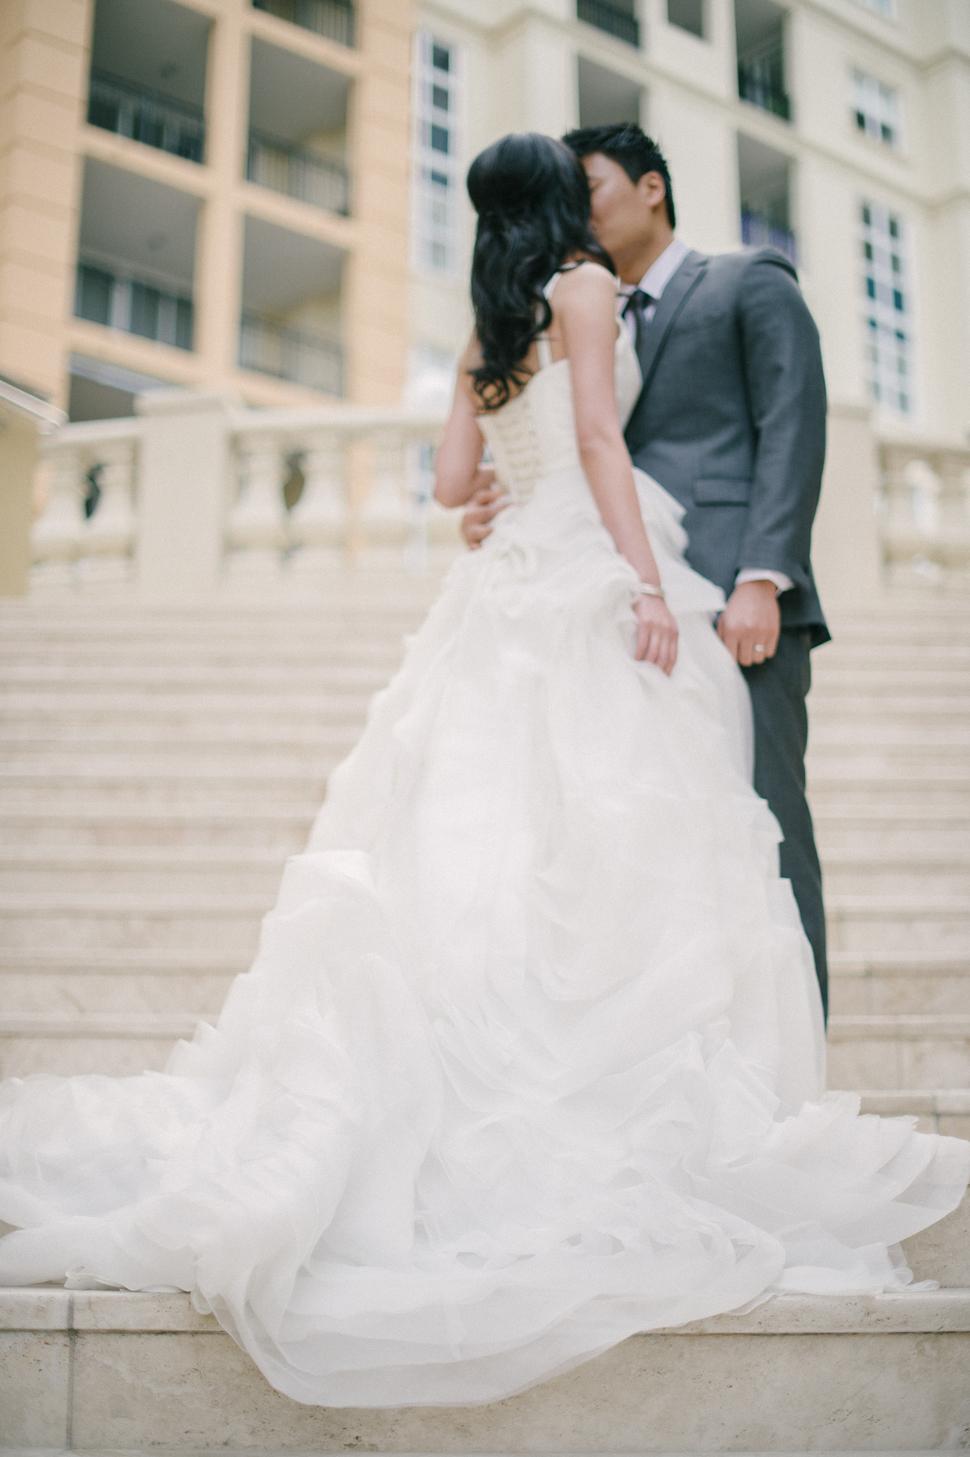 uyen-ron-wedding-emerald-lakes-gold-coast-photographer004